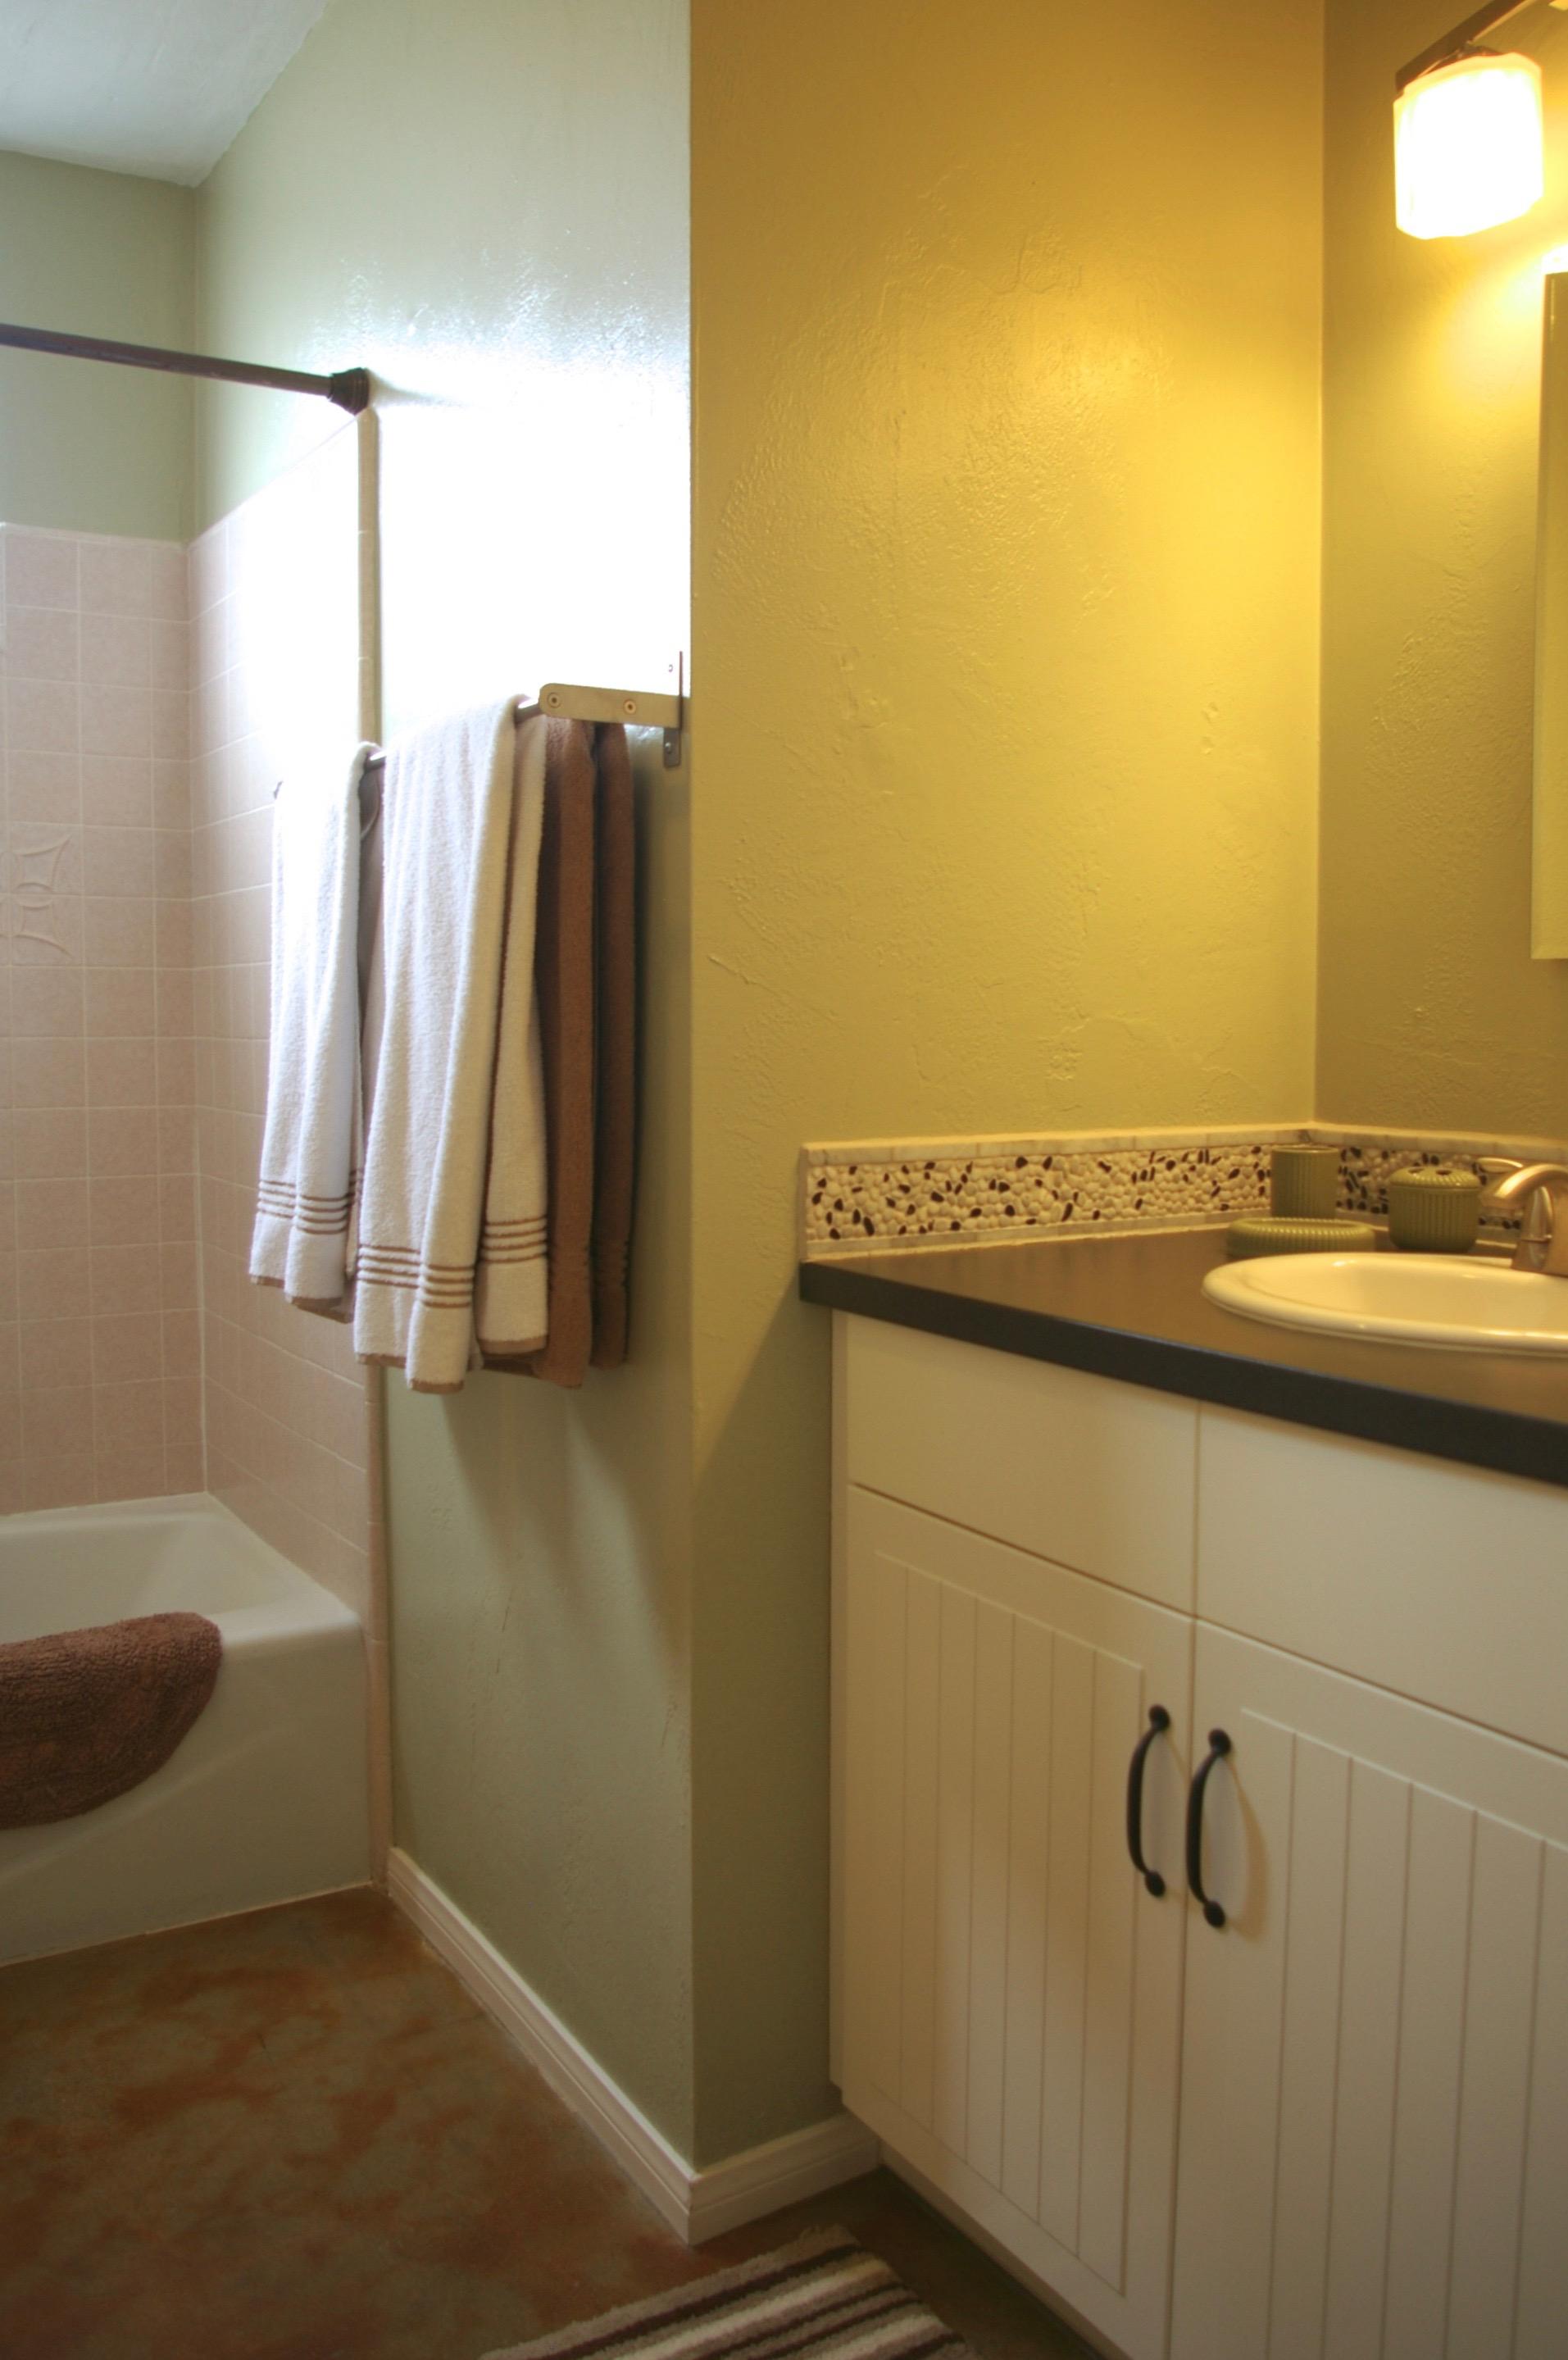 Rent29 Cactus West Bathroom